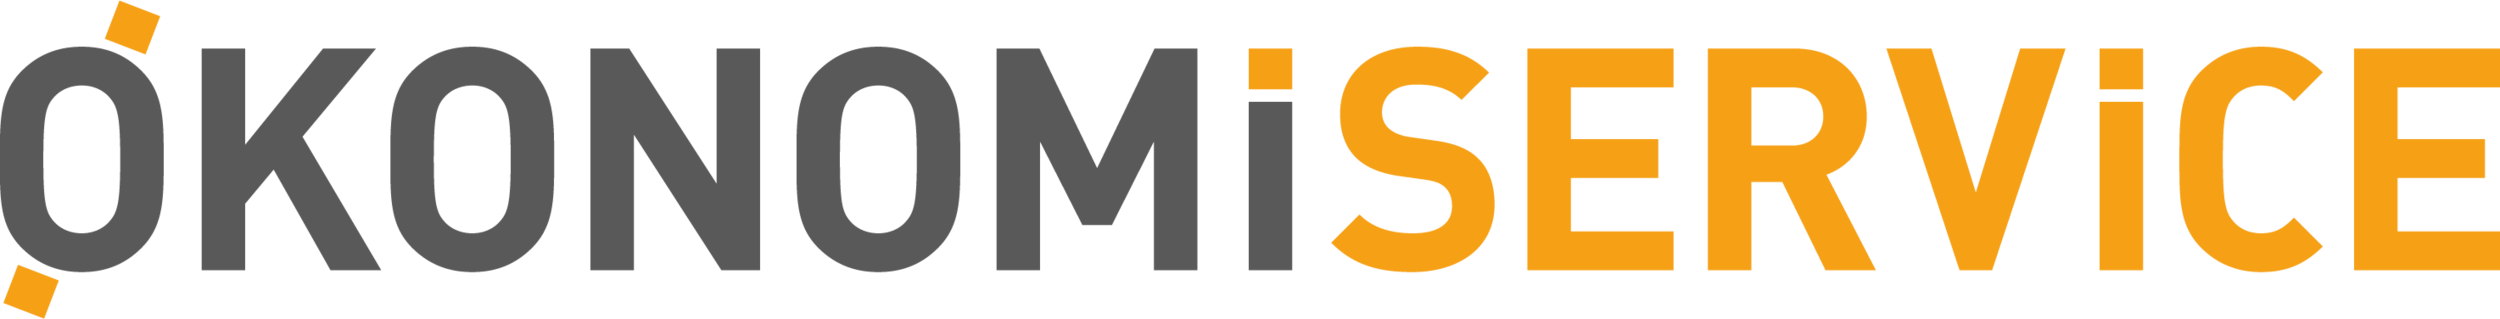 Logo-m3gs.png